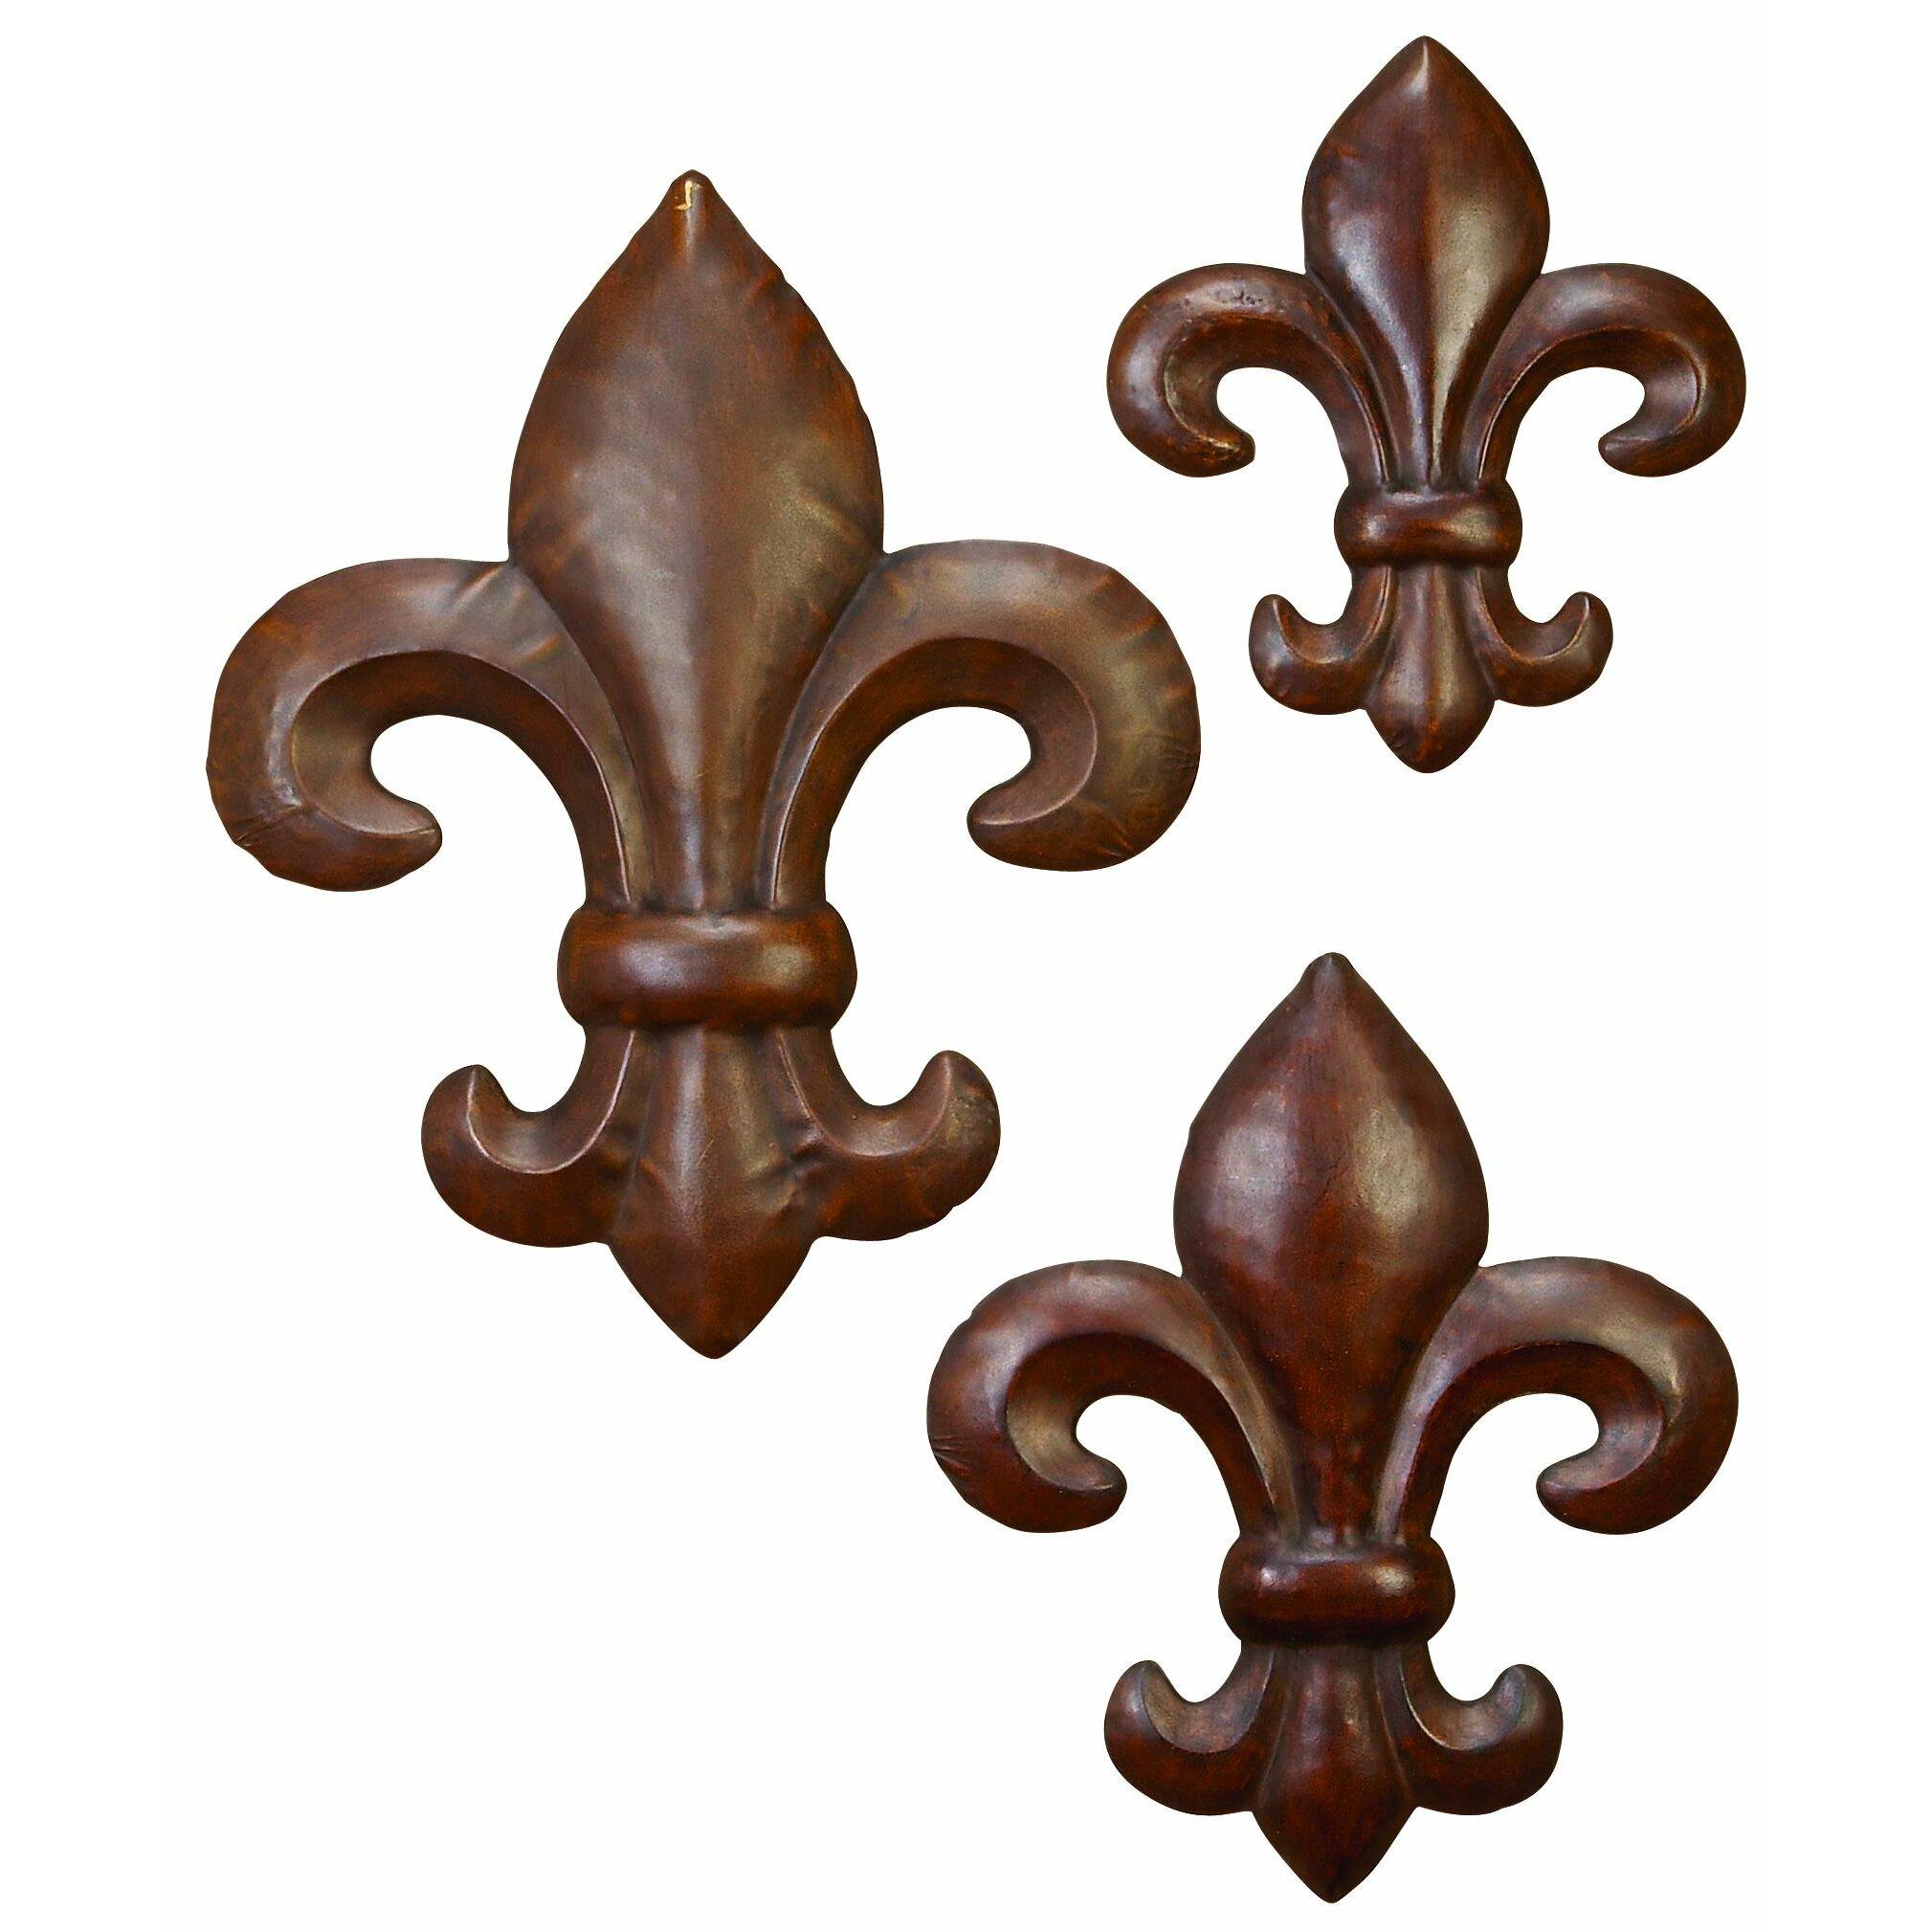 Bronze Wall Decor Woodland Imports 3 Piece Fleur De Lis Wall Dccor Set Reviews